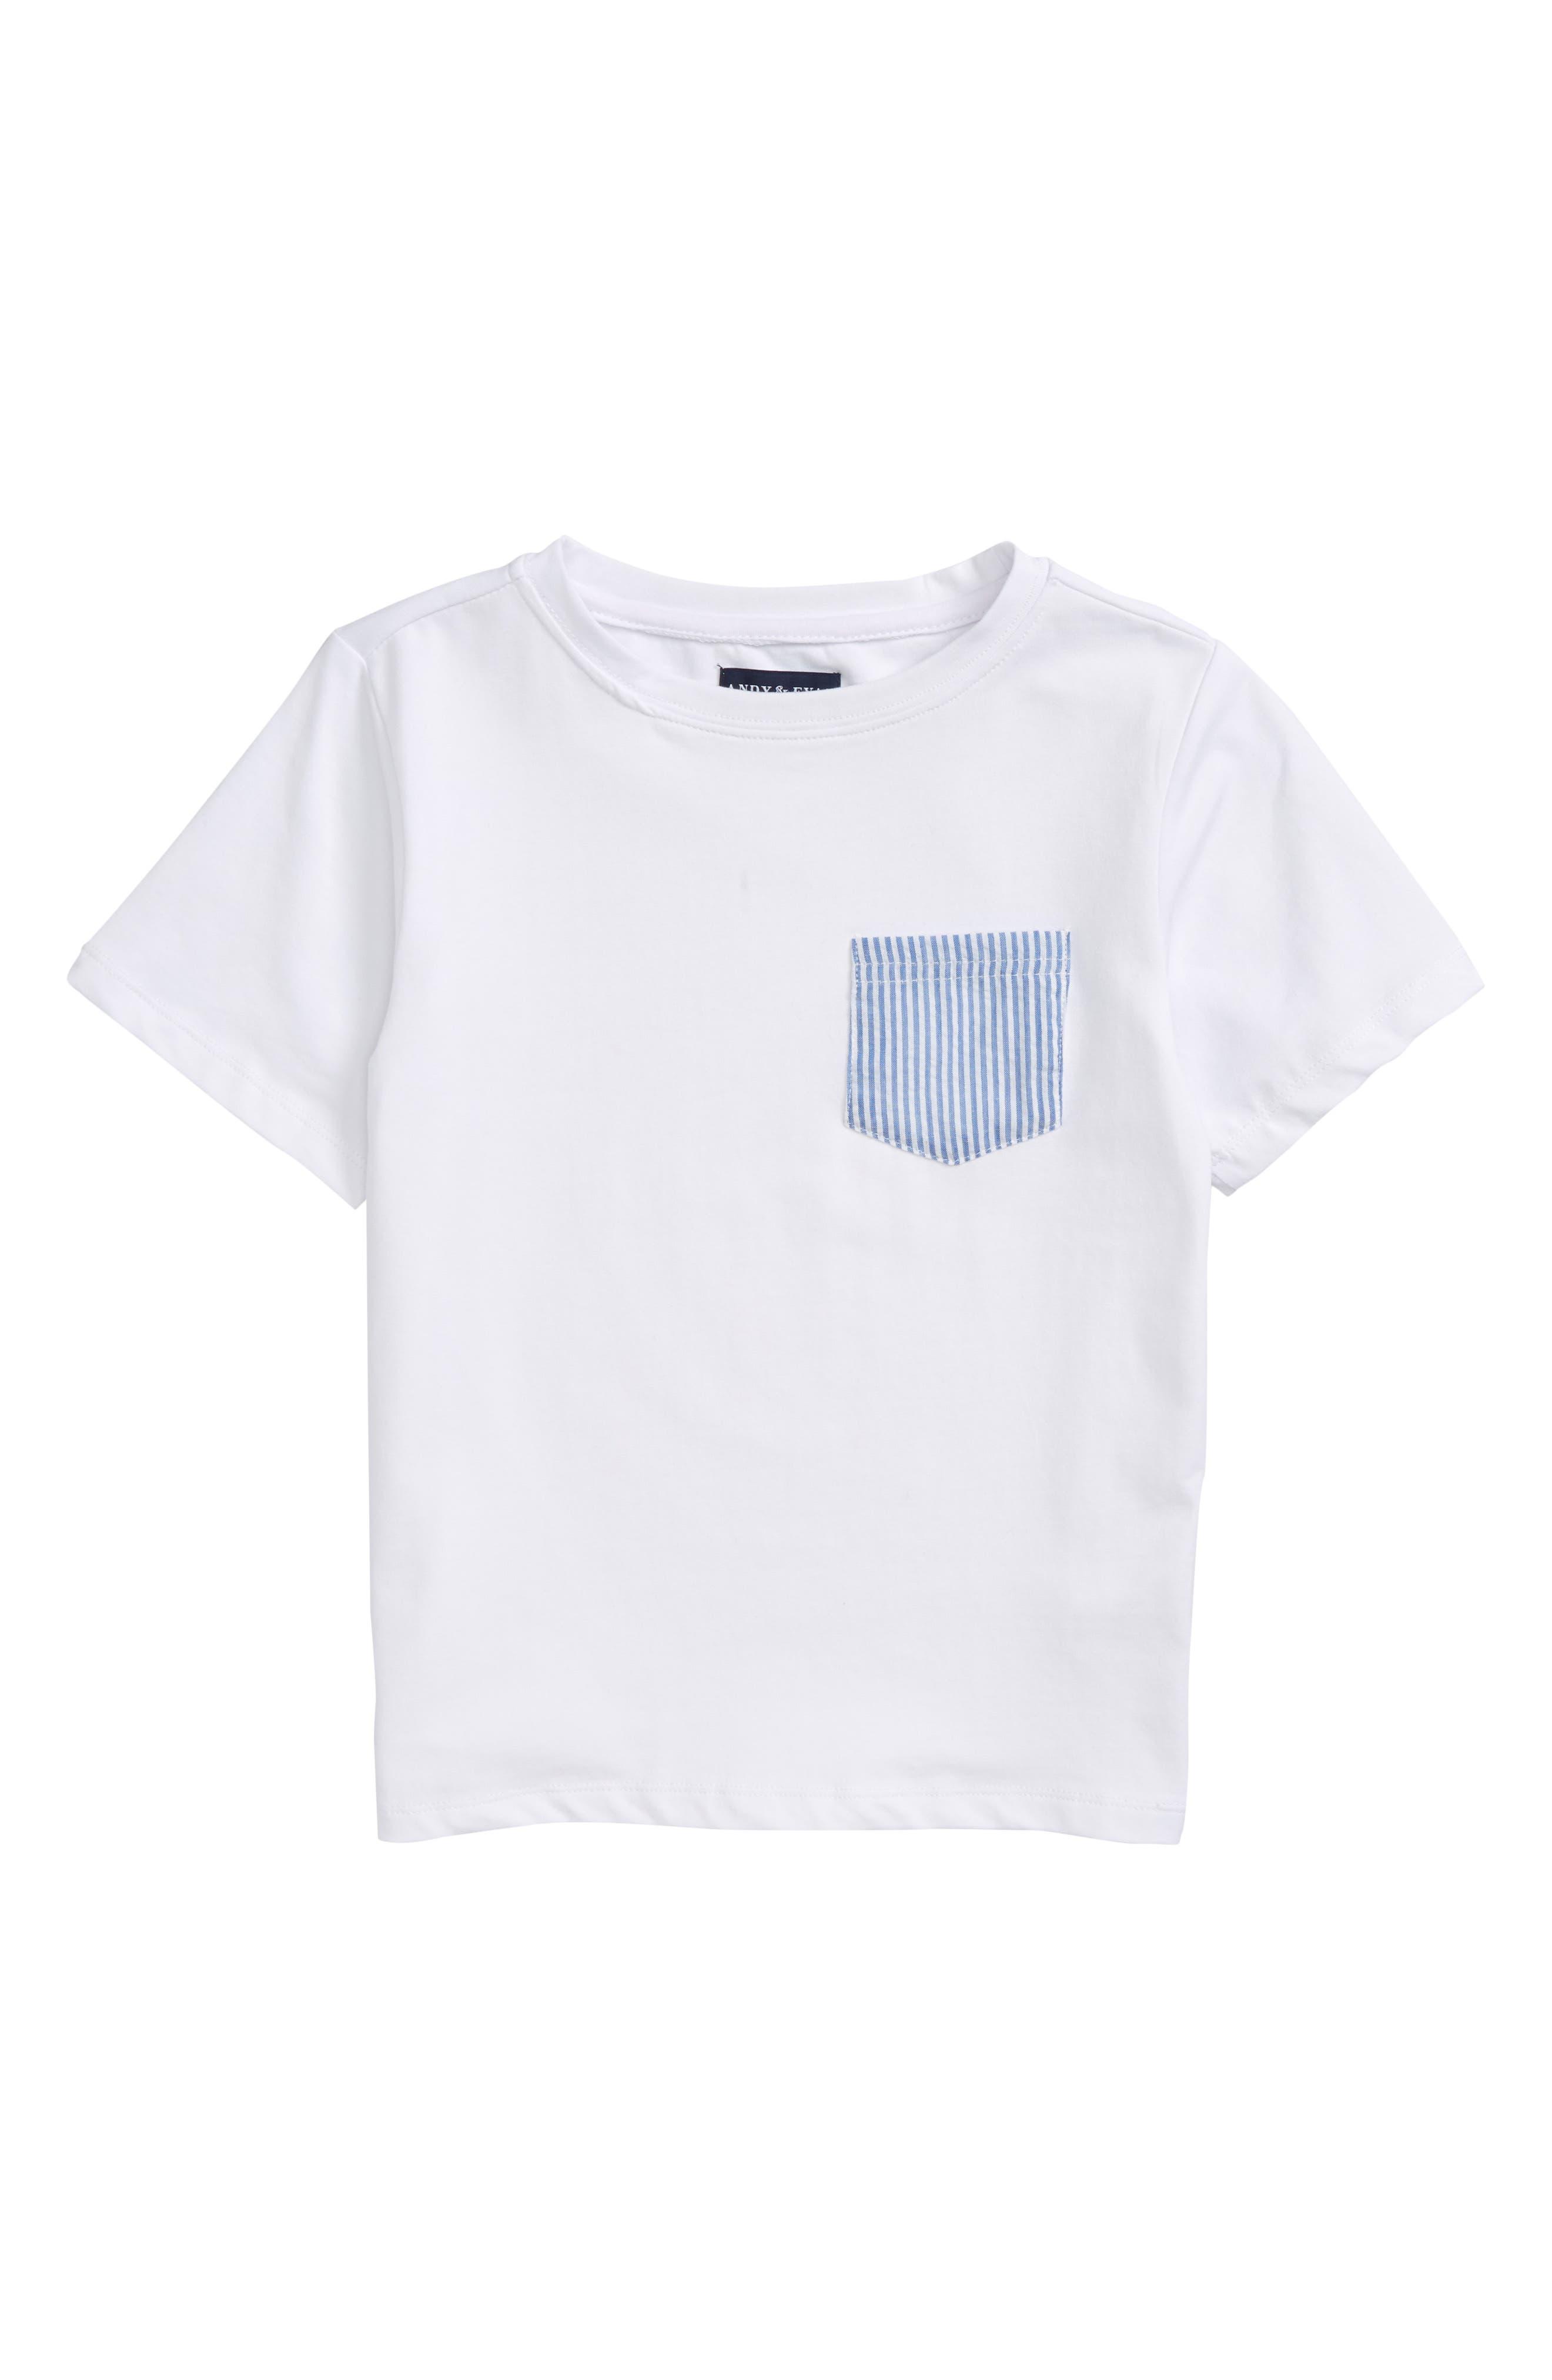 Seersucker Pocket T-Shirt,                         Main,                         color, White